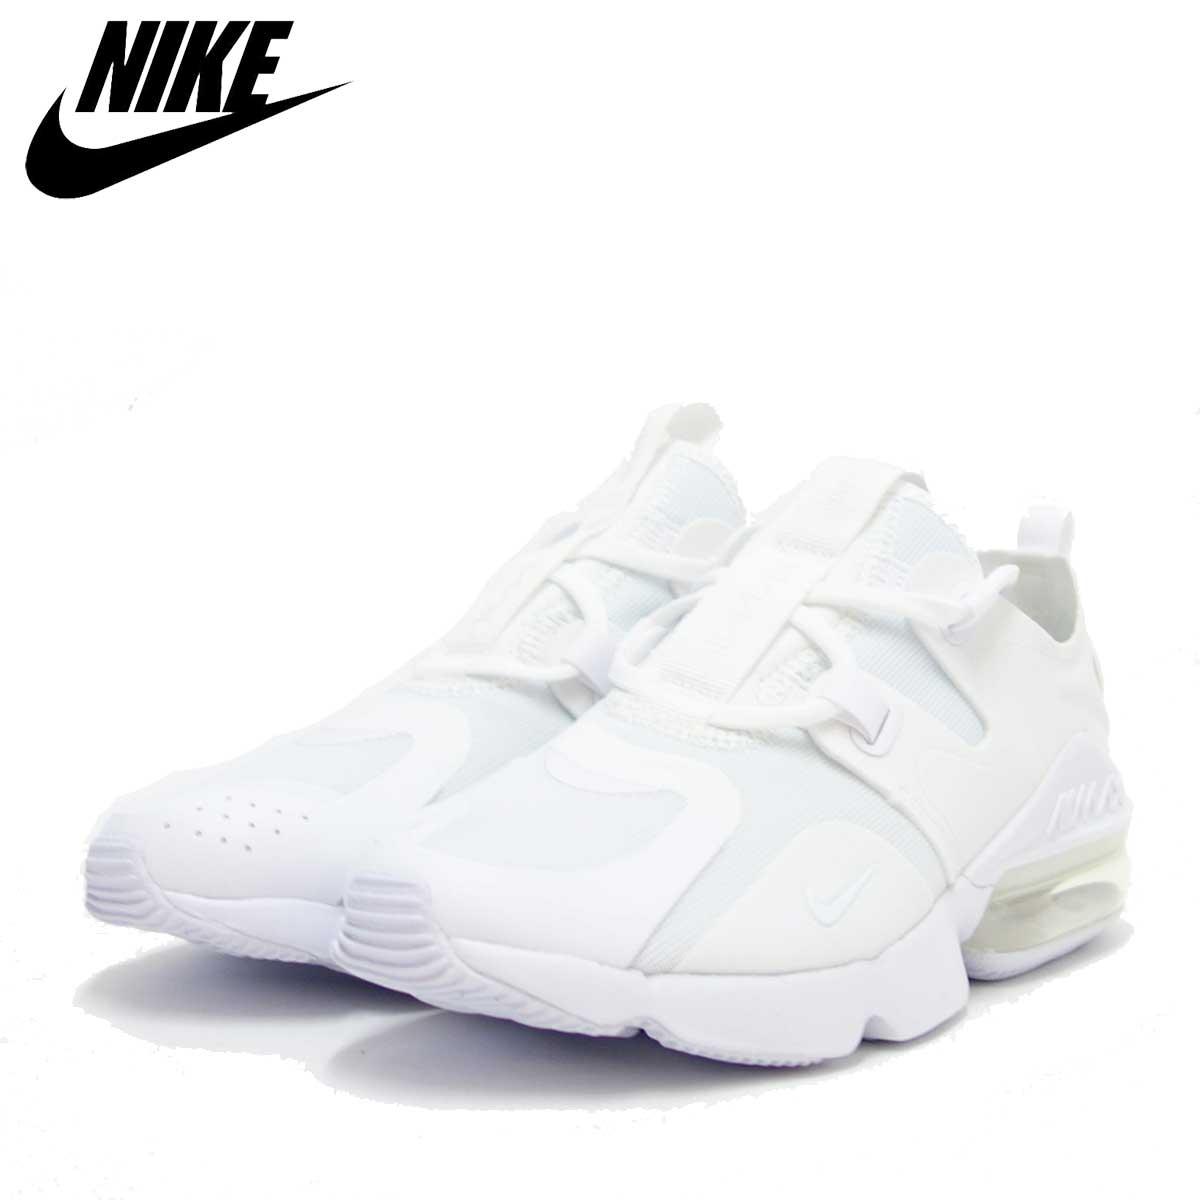 NIKE ナイキ ウィメンズ エアマックス インフィニティ BQ4284 100 ホワイト(レディース) W NIKE AIR MAX INFINITY 「靴」